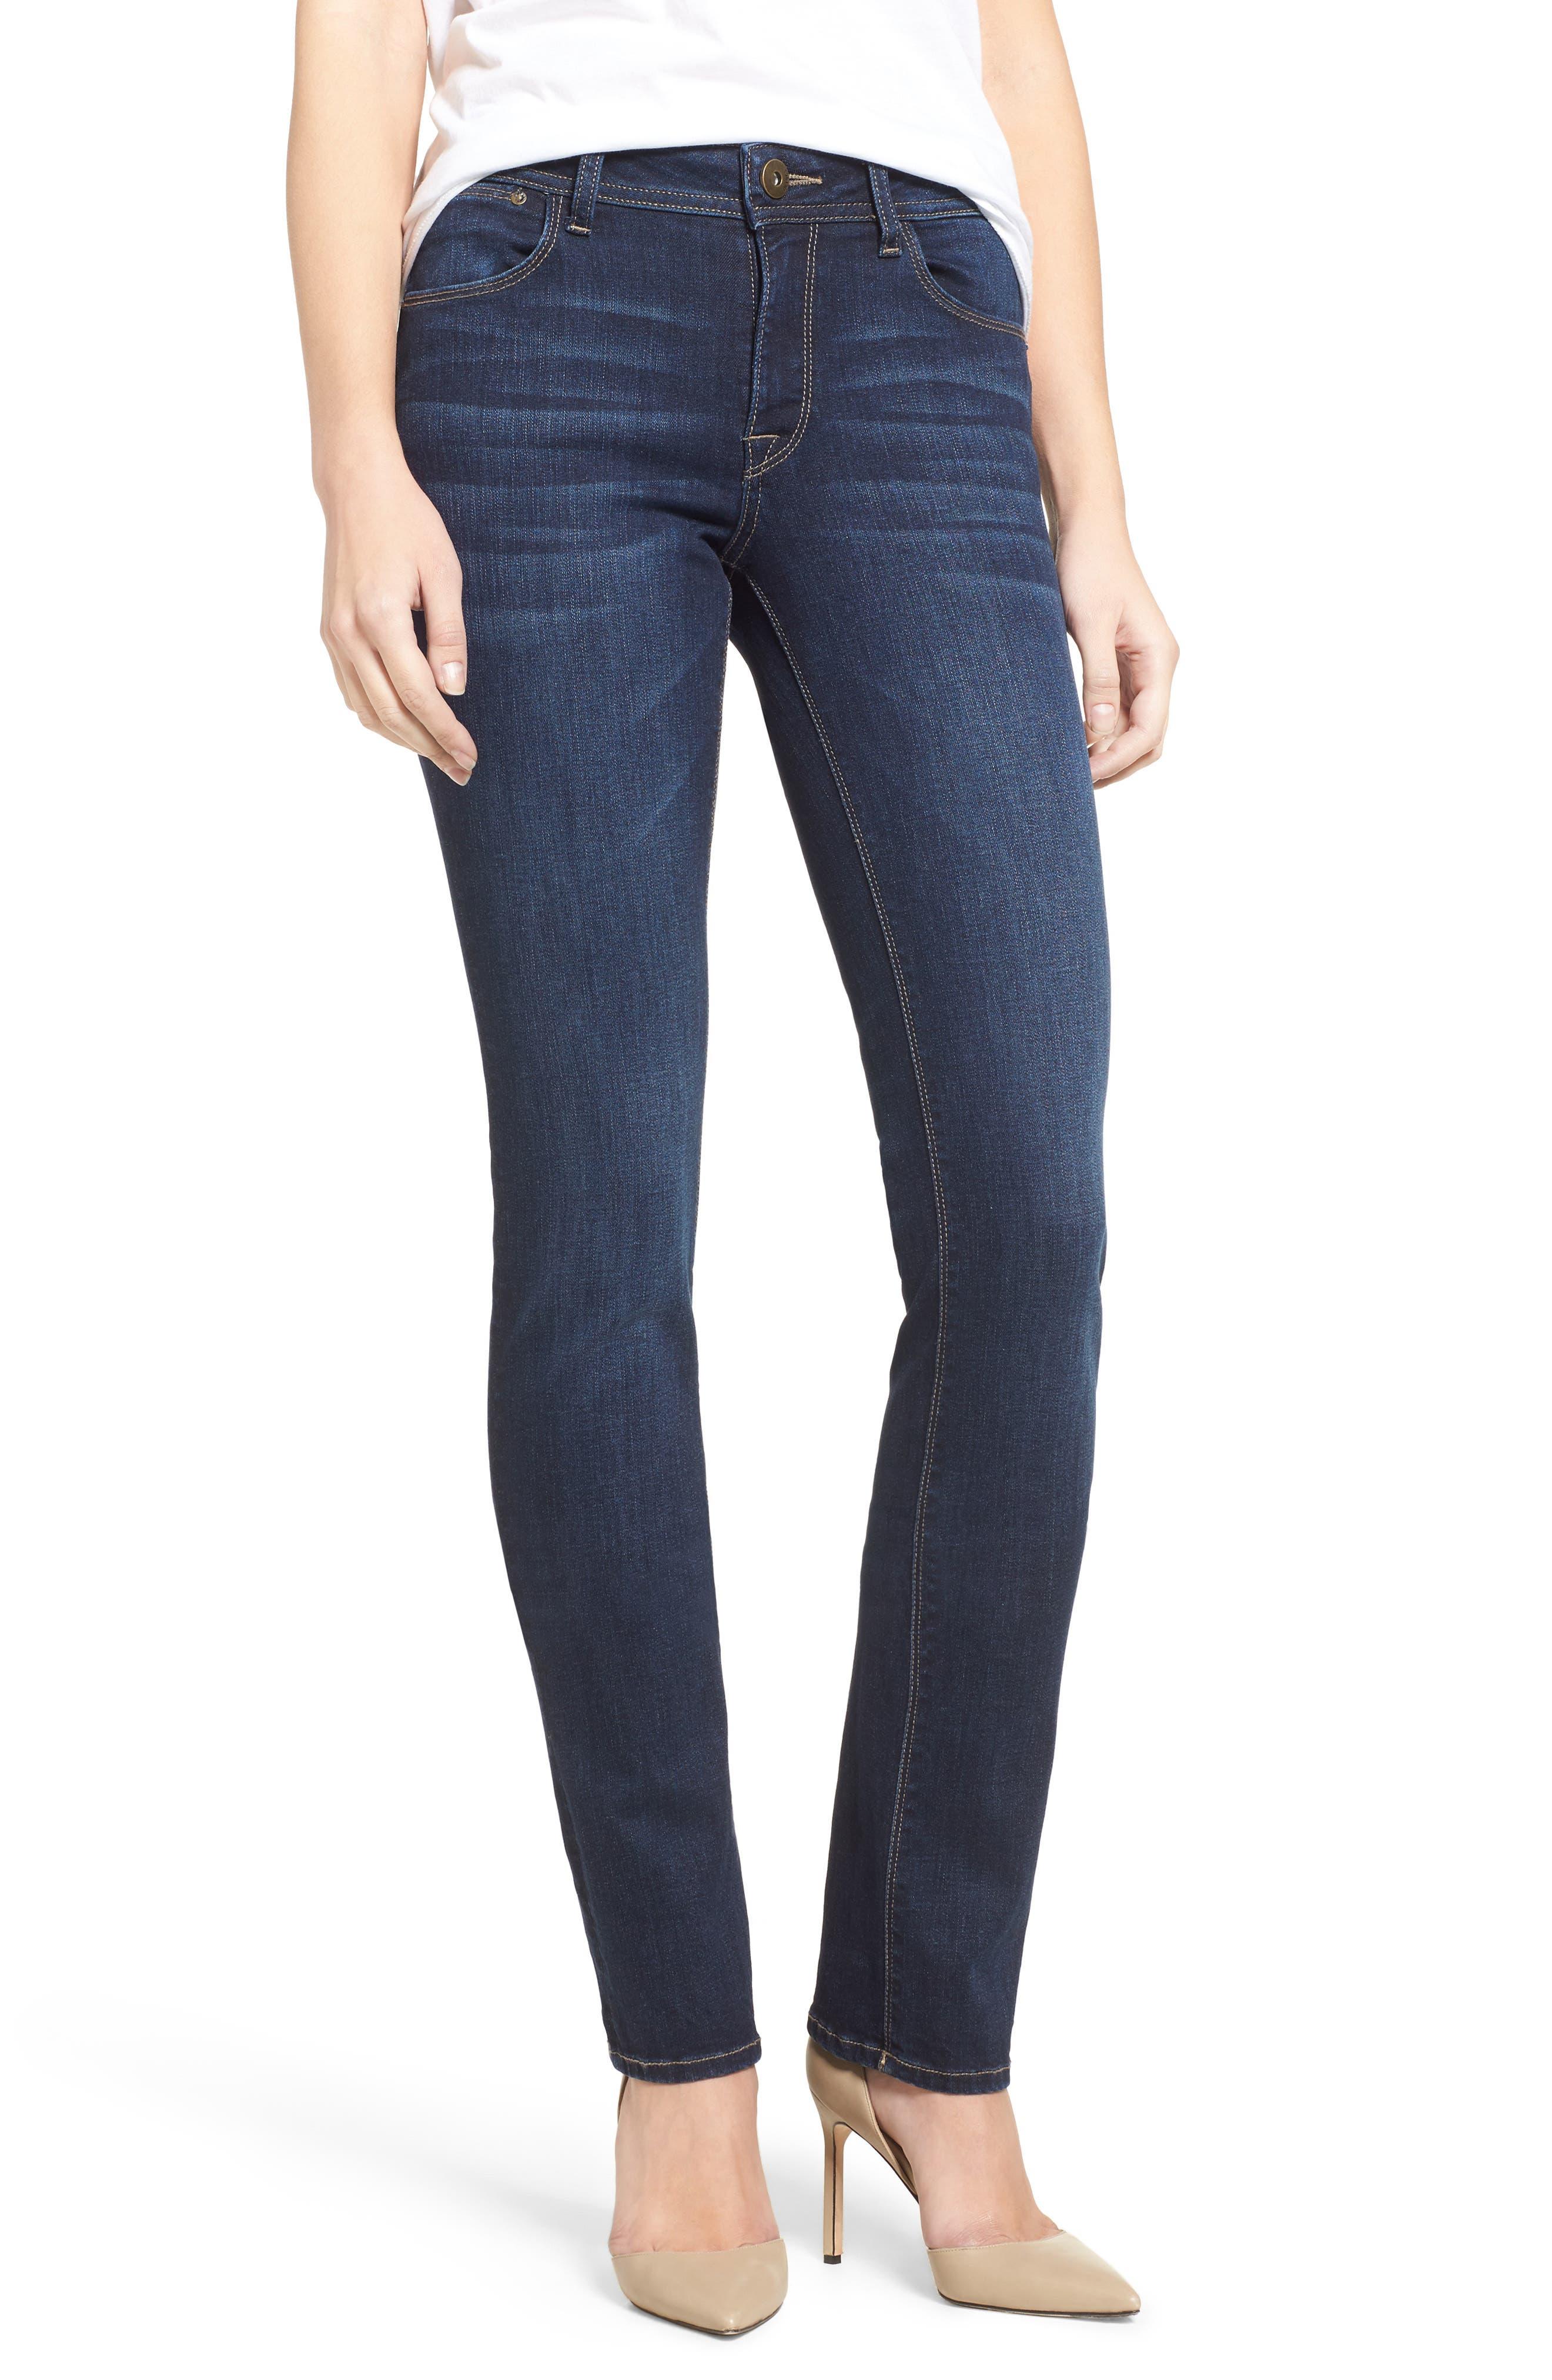 'Coco' Curvy Slim Straight Leg Jeans,                         Main,                         color, 405